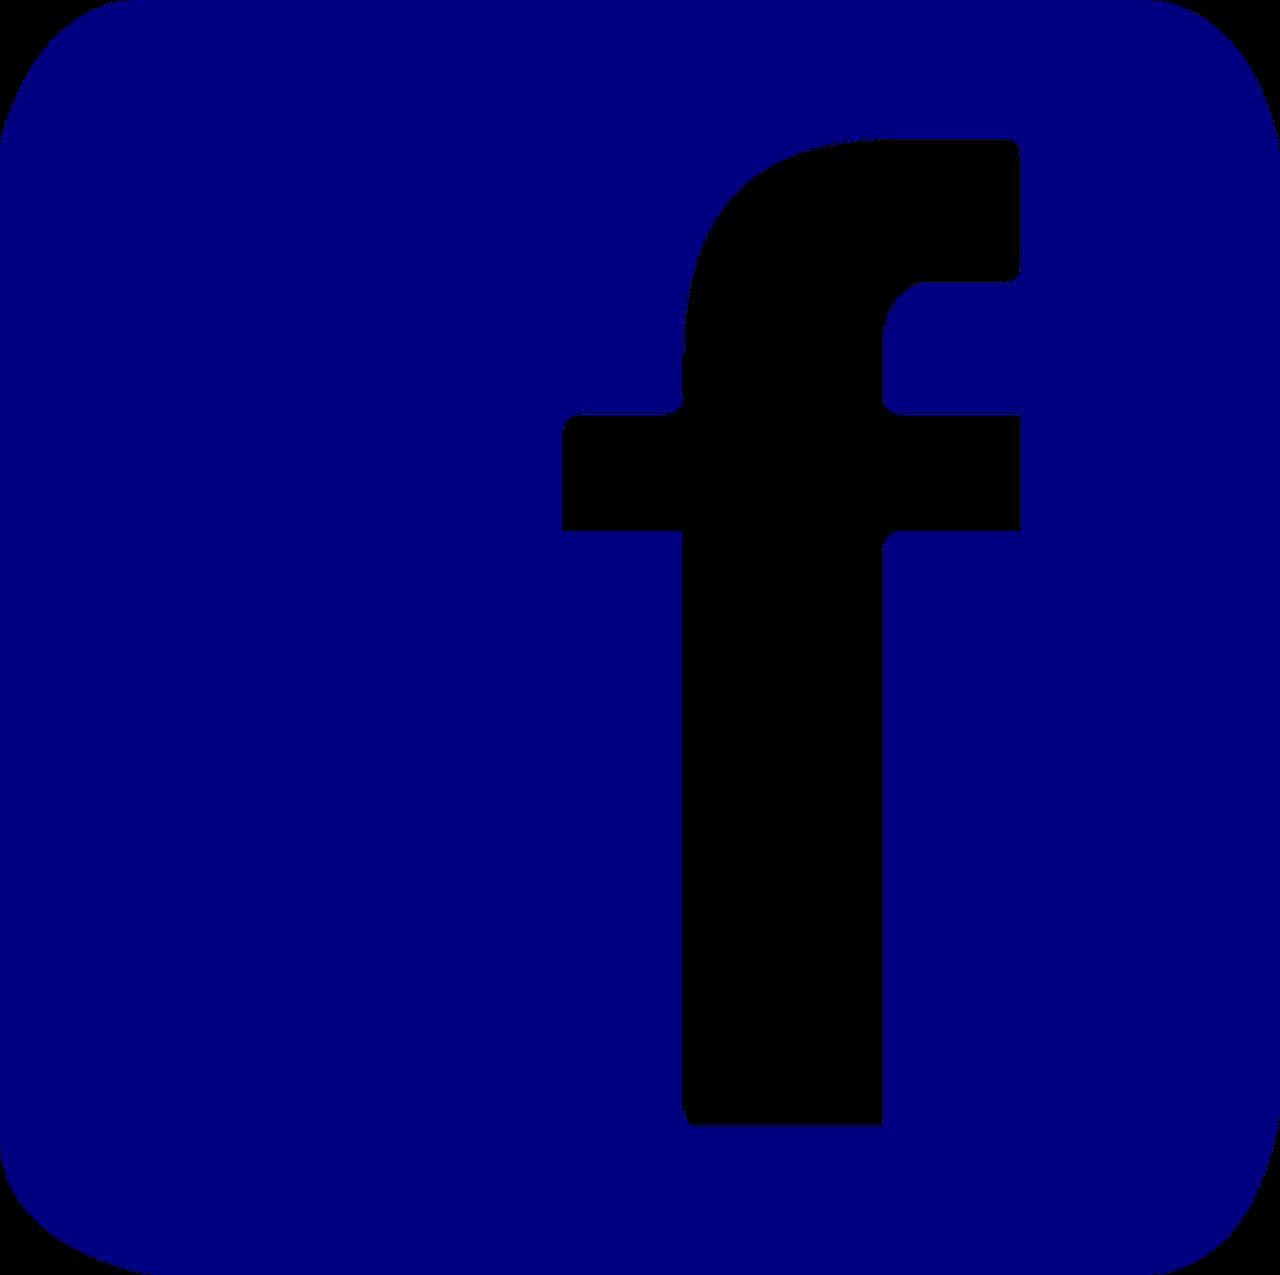 logo facebook do pobrania